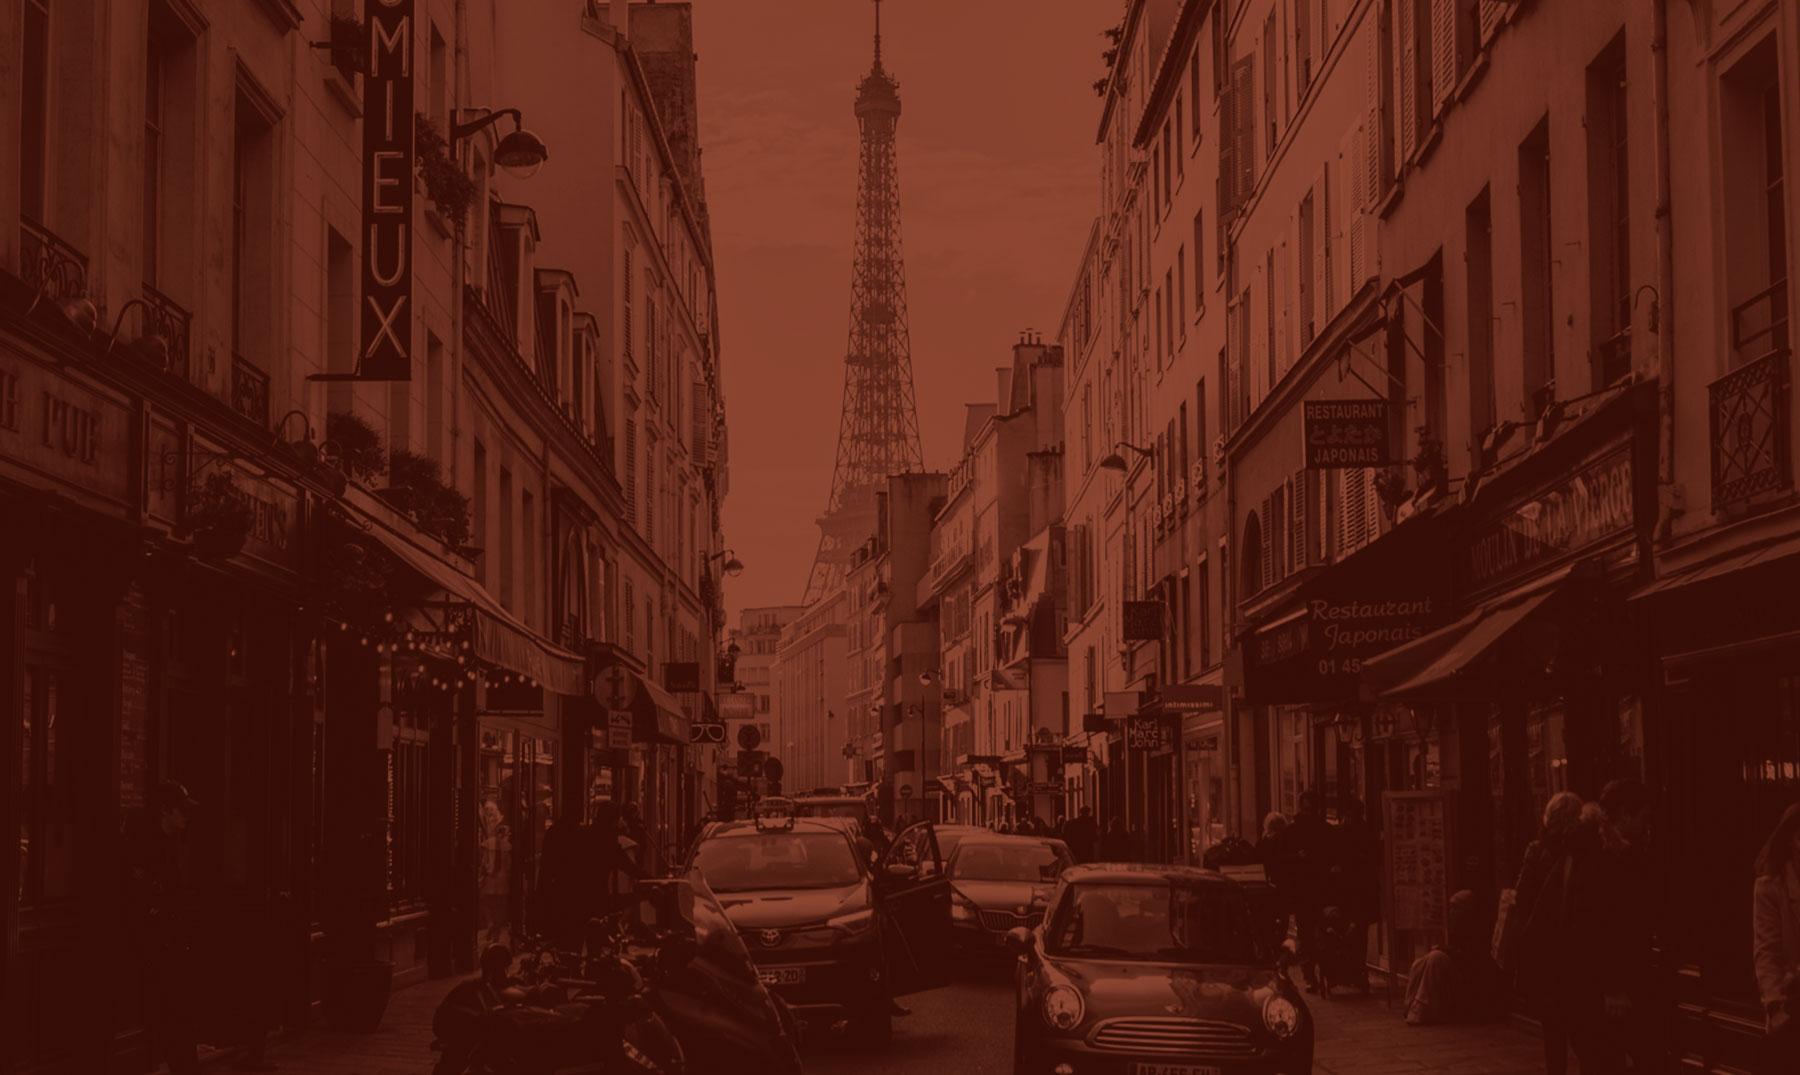 http://www.bethelanguage.com/wp-content/uploads/2018/08/Background-French-Be-The-Language.jpg